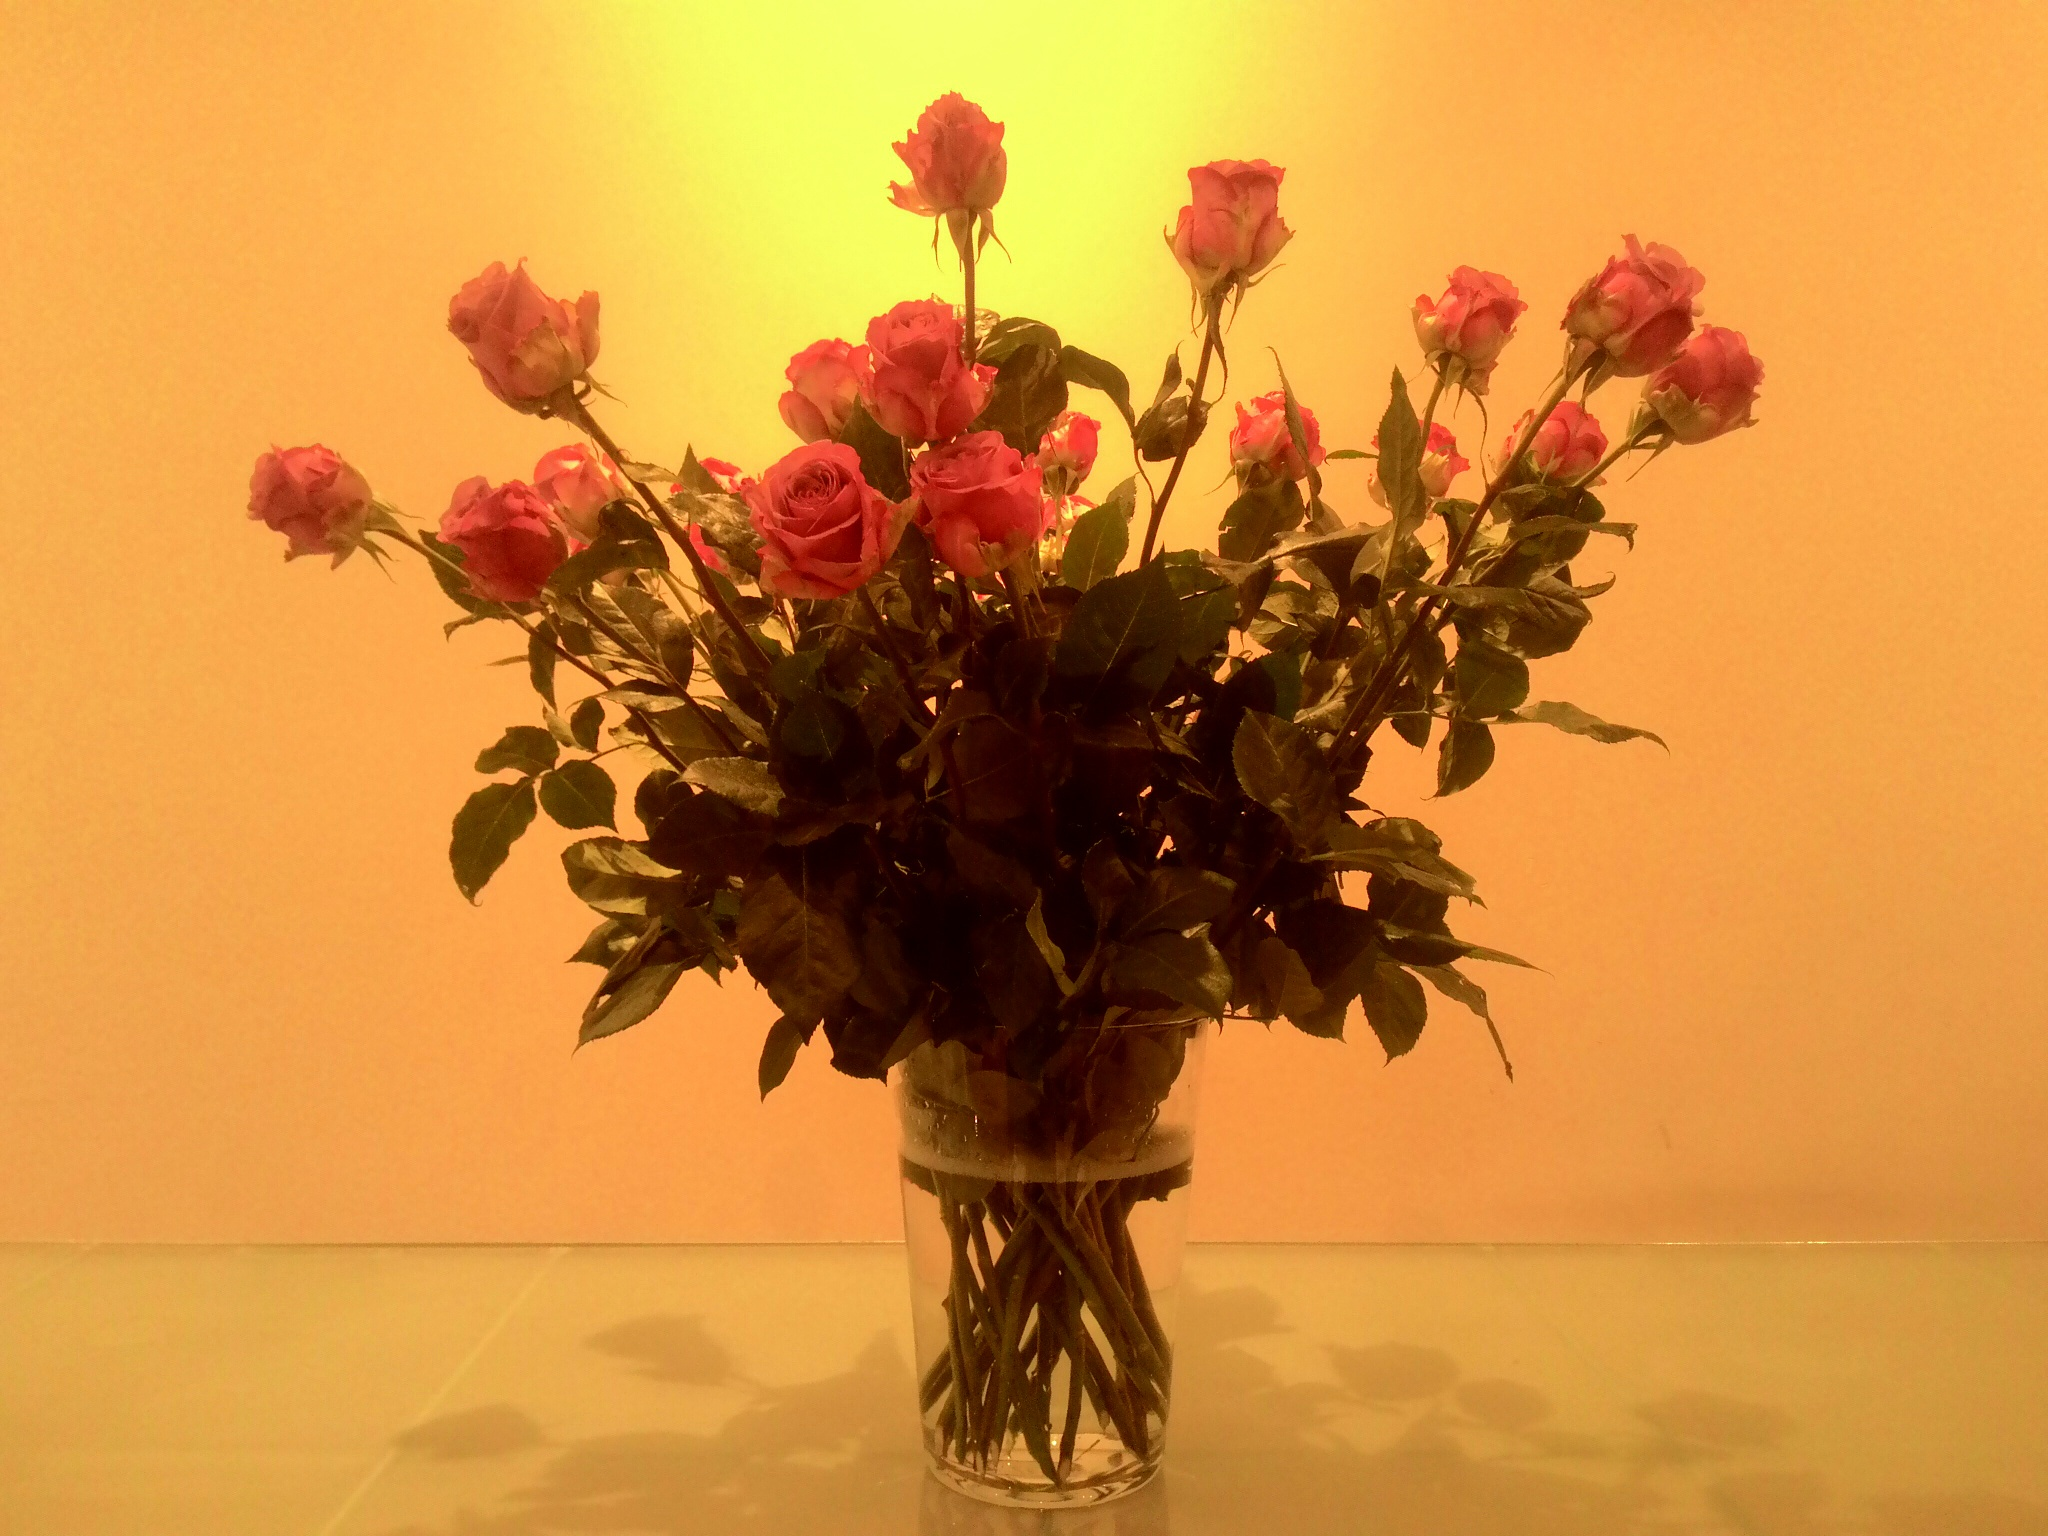 Still love You by vinzarka